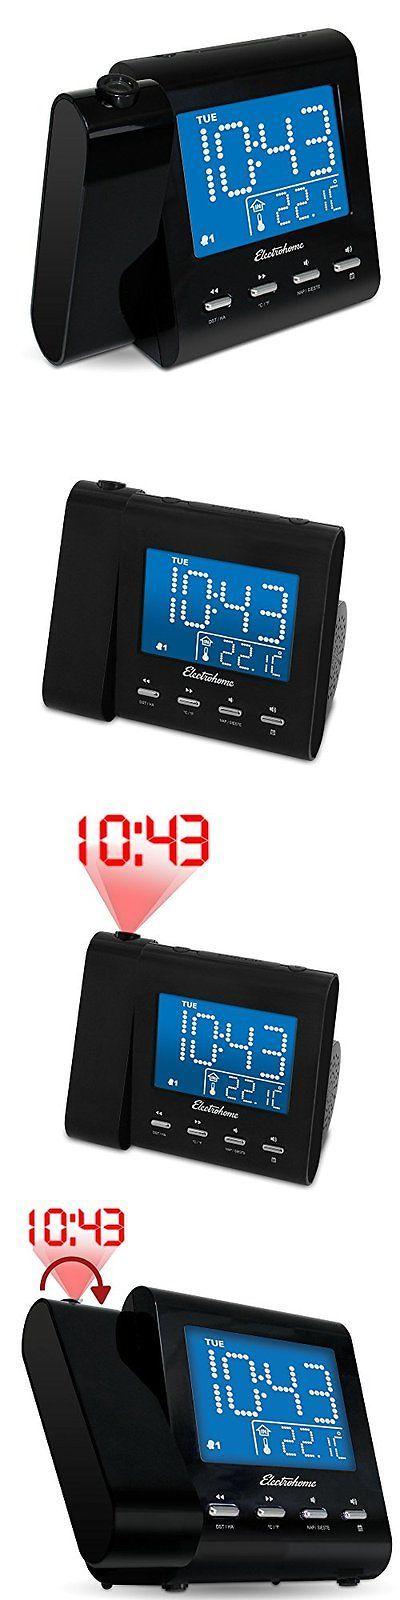 1000 digital wecker pinterest digital clocks and clock radios electrohome eaac601 projection alarm clock with amfm radio fandeluxe Gallery